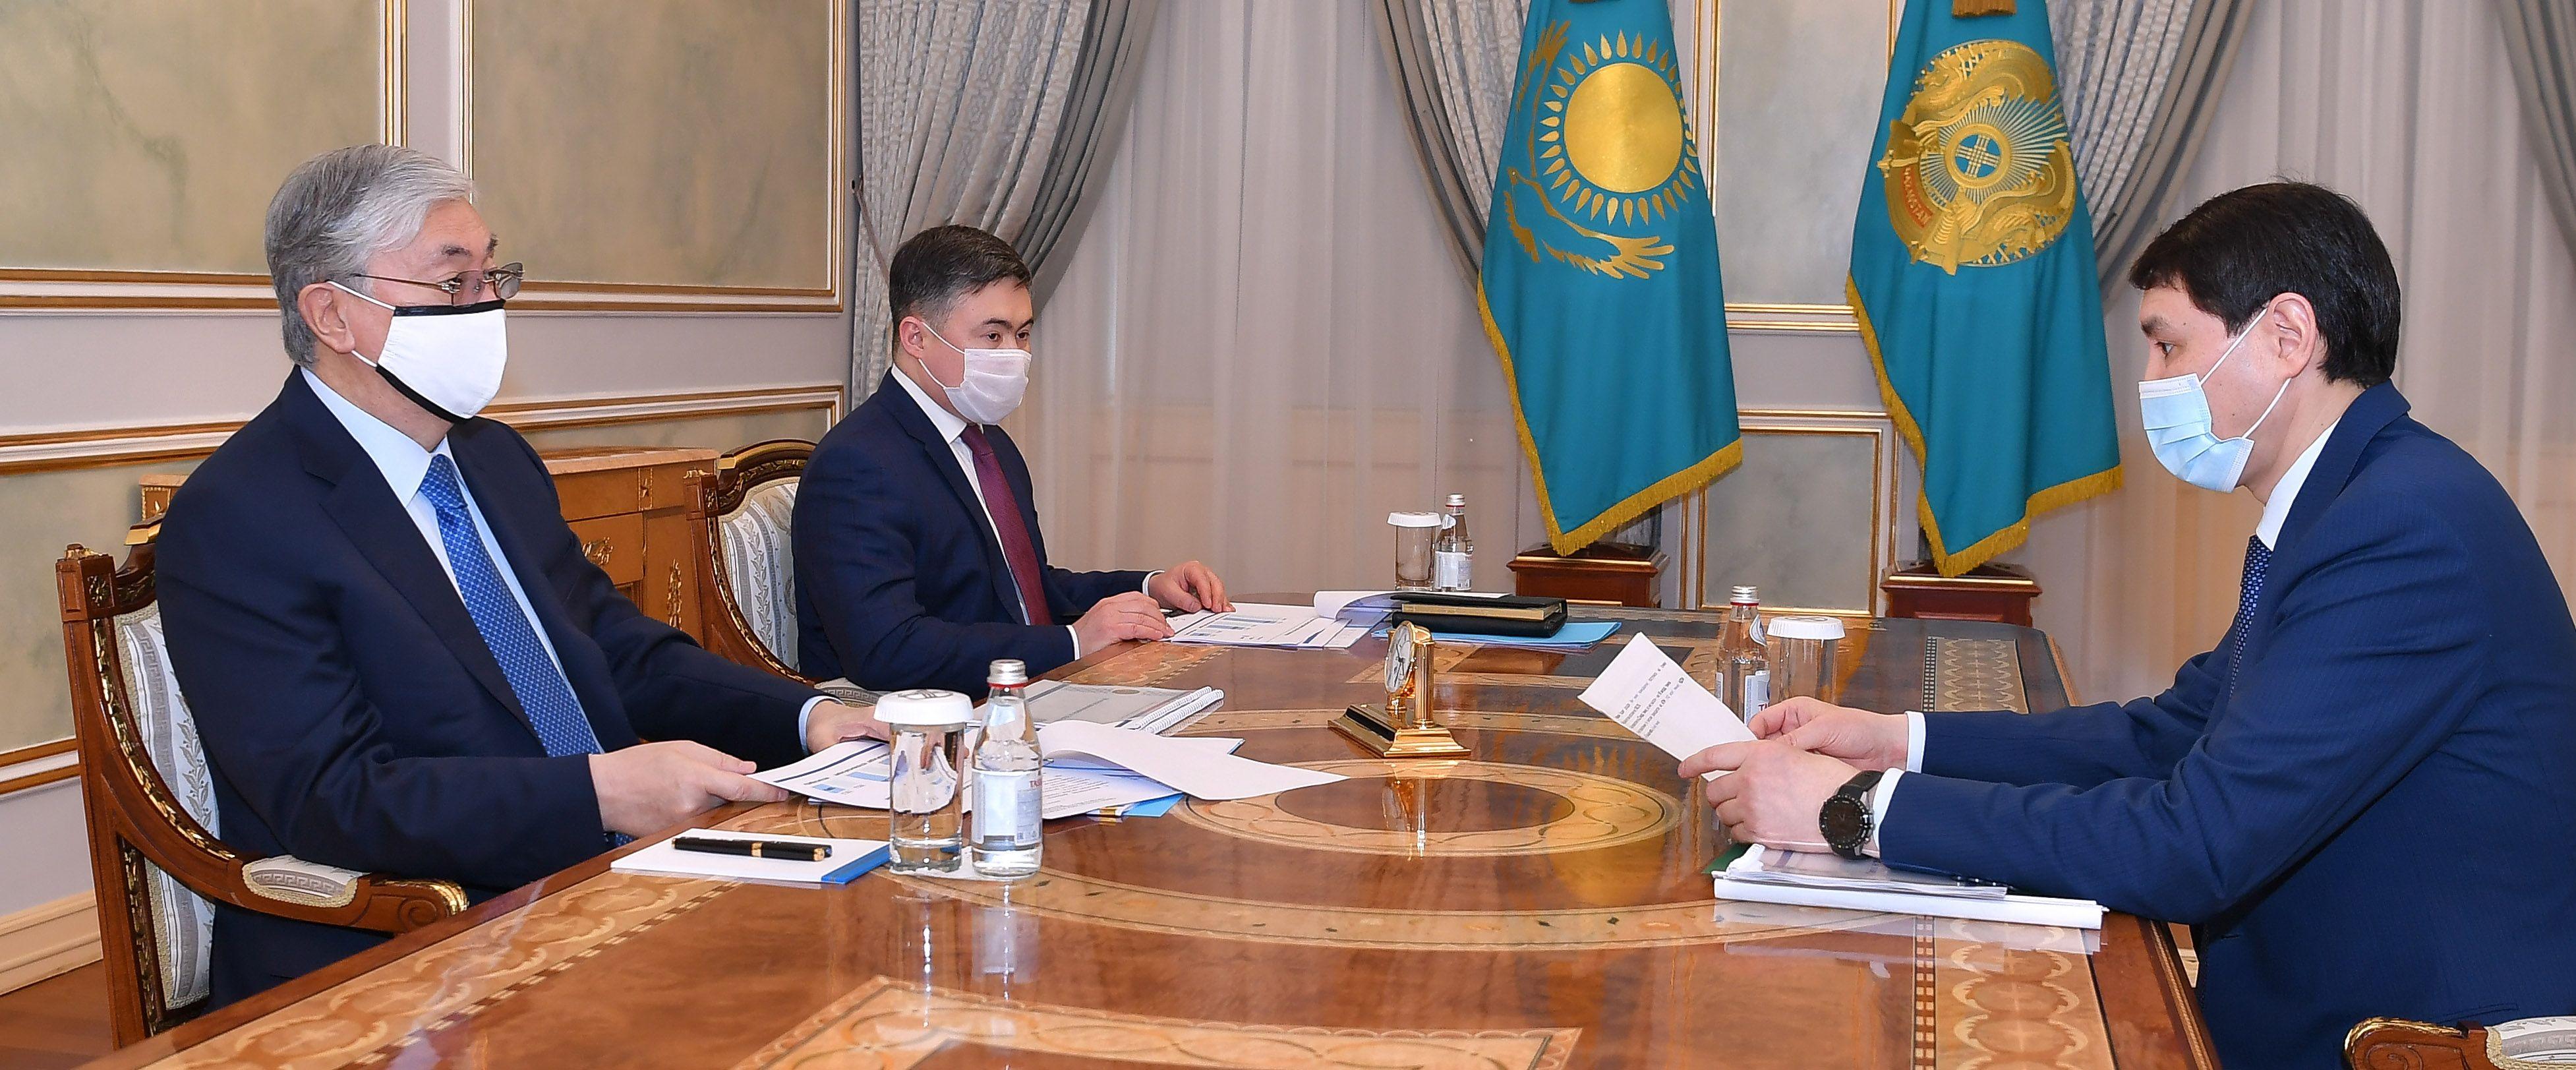 Президент поручил Минфину оптимизировать бюджет- Kapital.kz